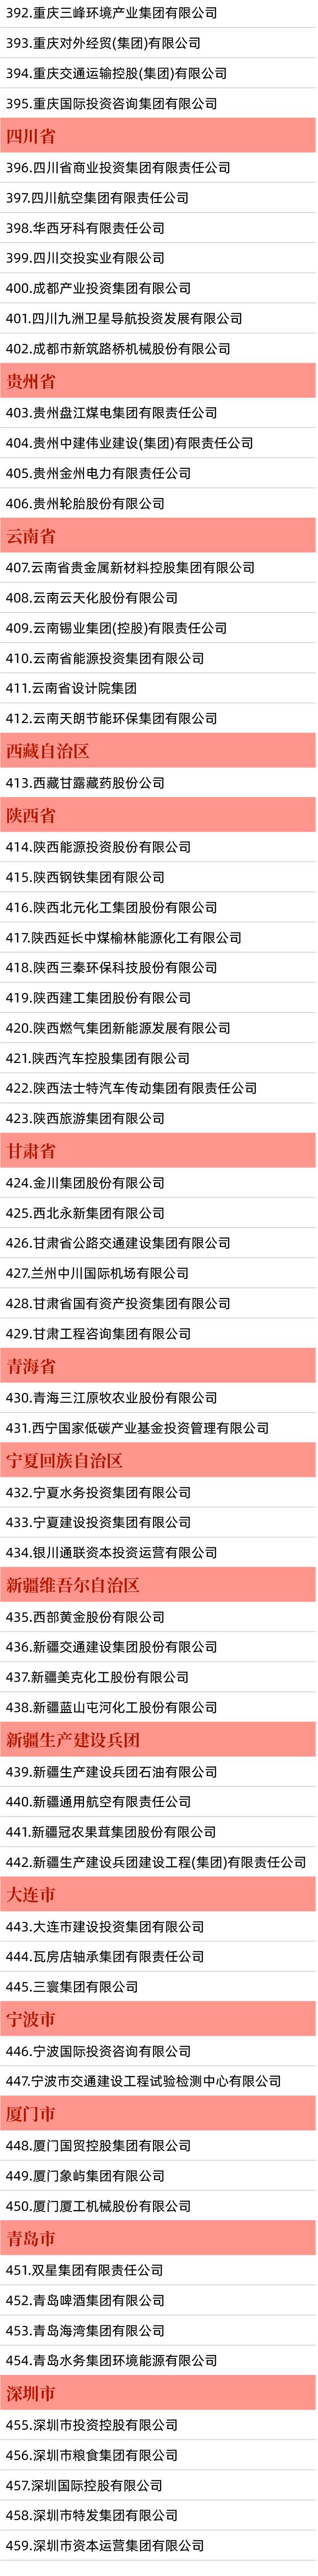 """�p百企�I""最新名�喂�布 福建�@些企�I上榜"